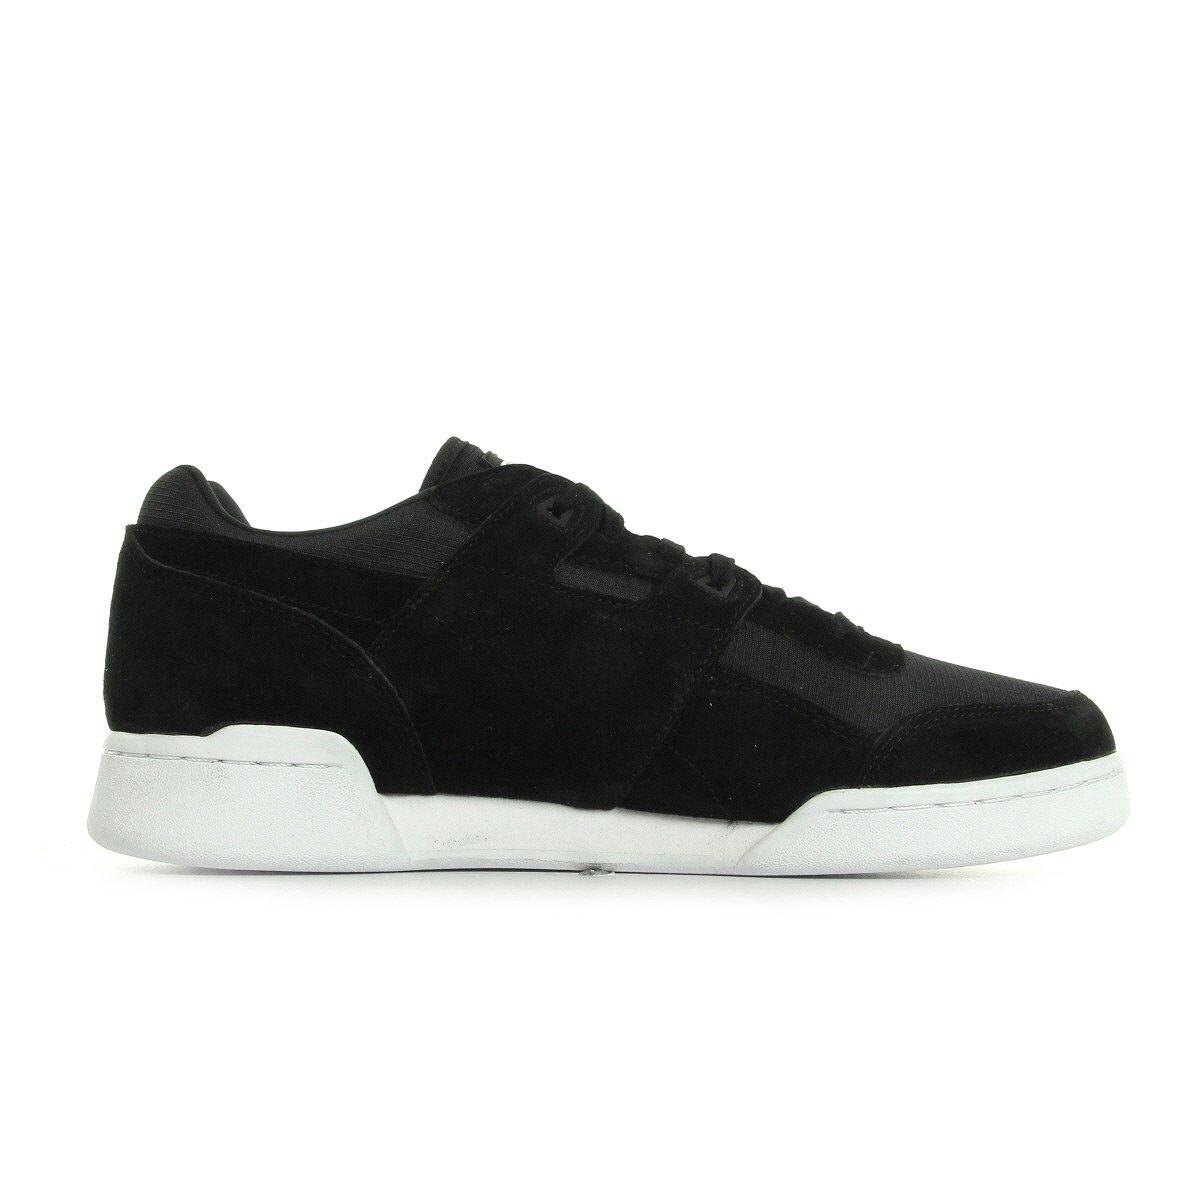 49276372803 Reebok Workout Plus Cordura Men s Trainers - Black (UK 12 EU 47)  Amazon.co. uk  Shoes   Bags